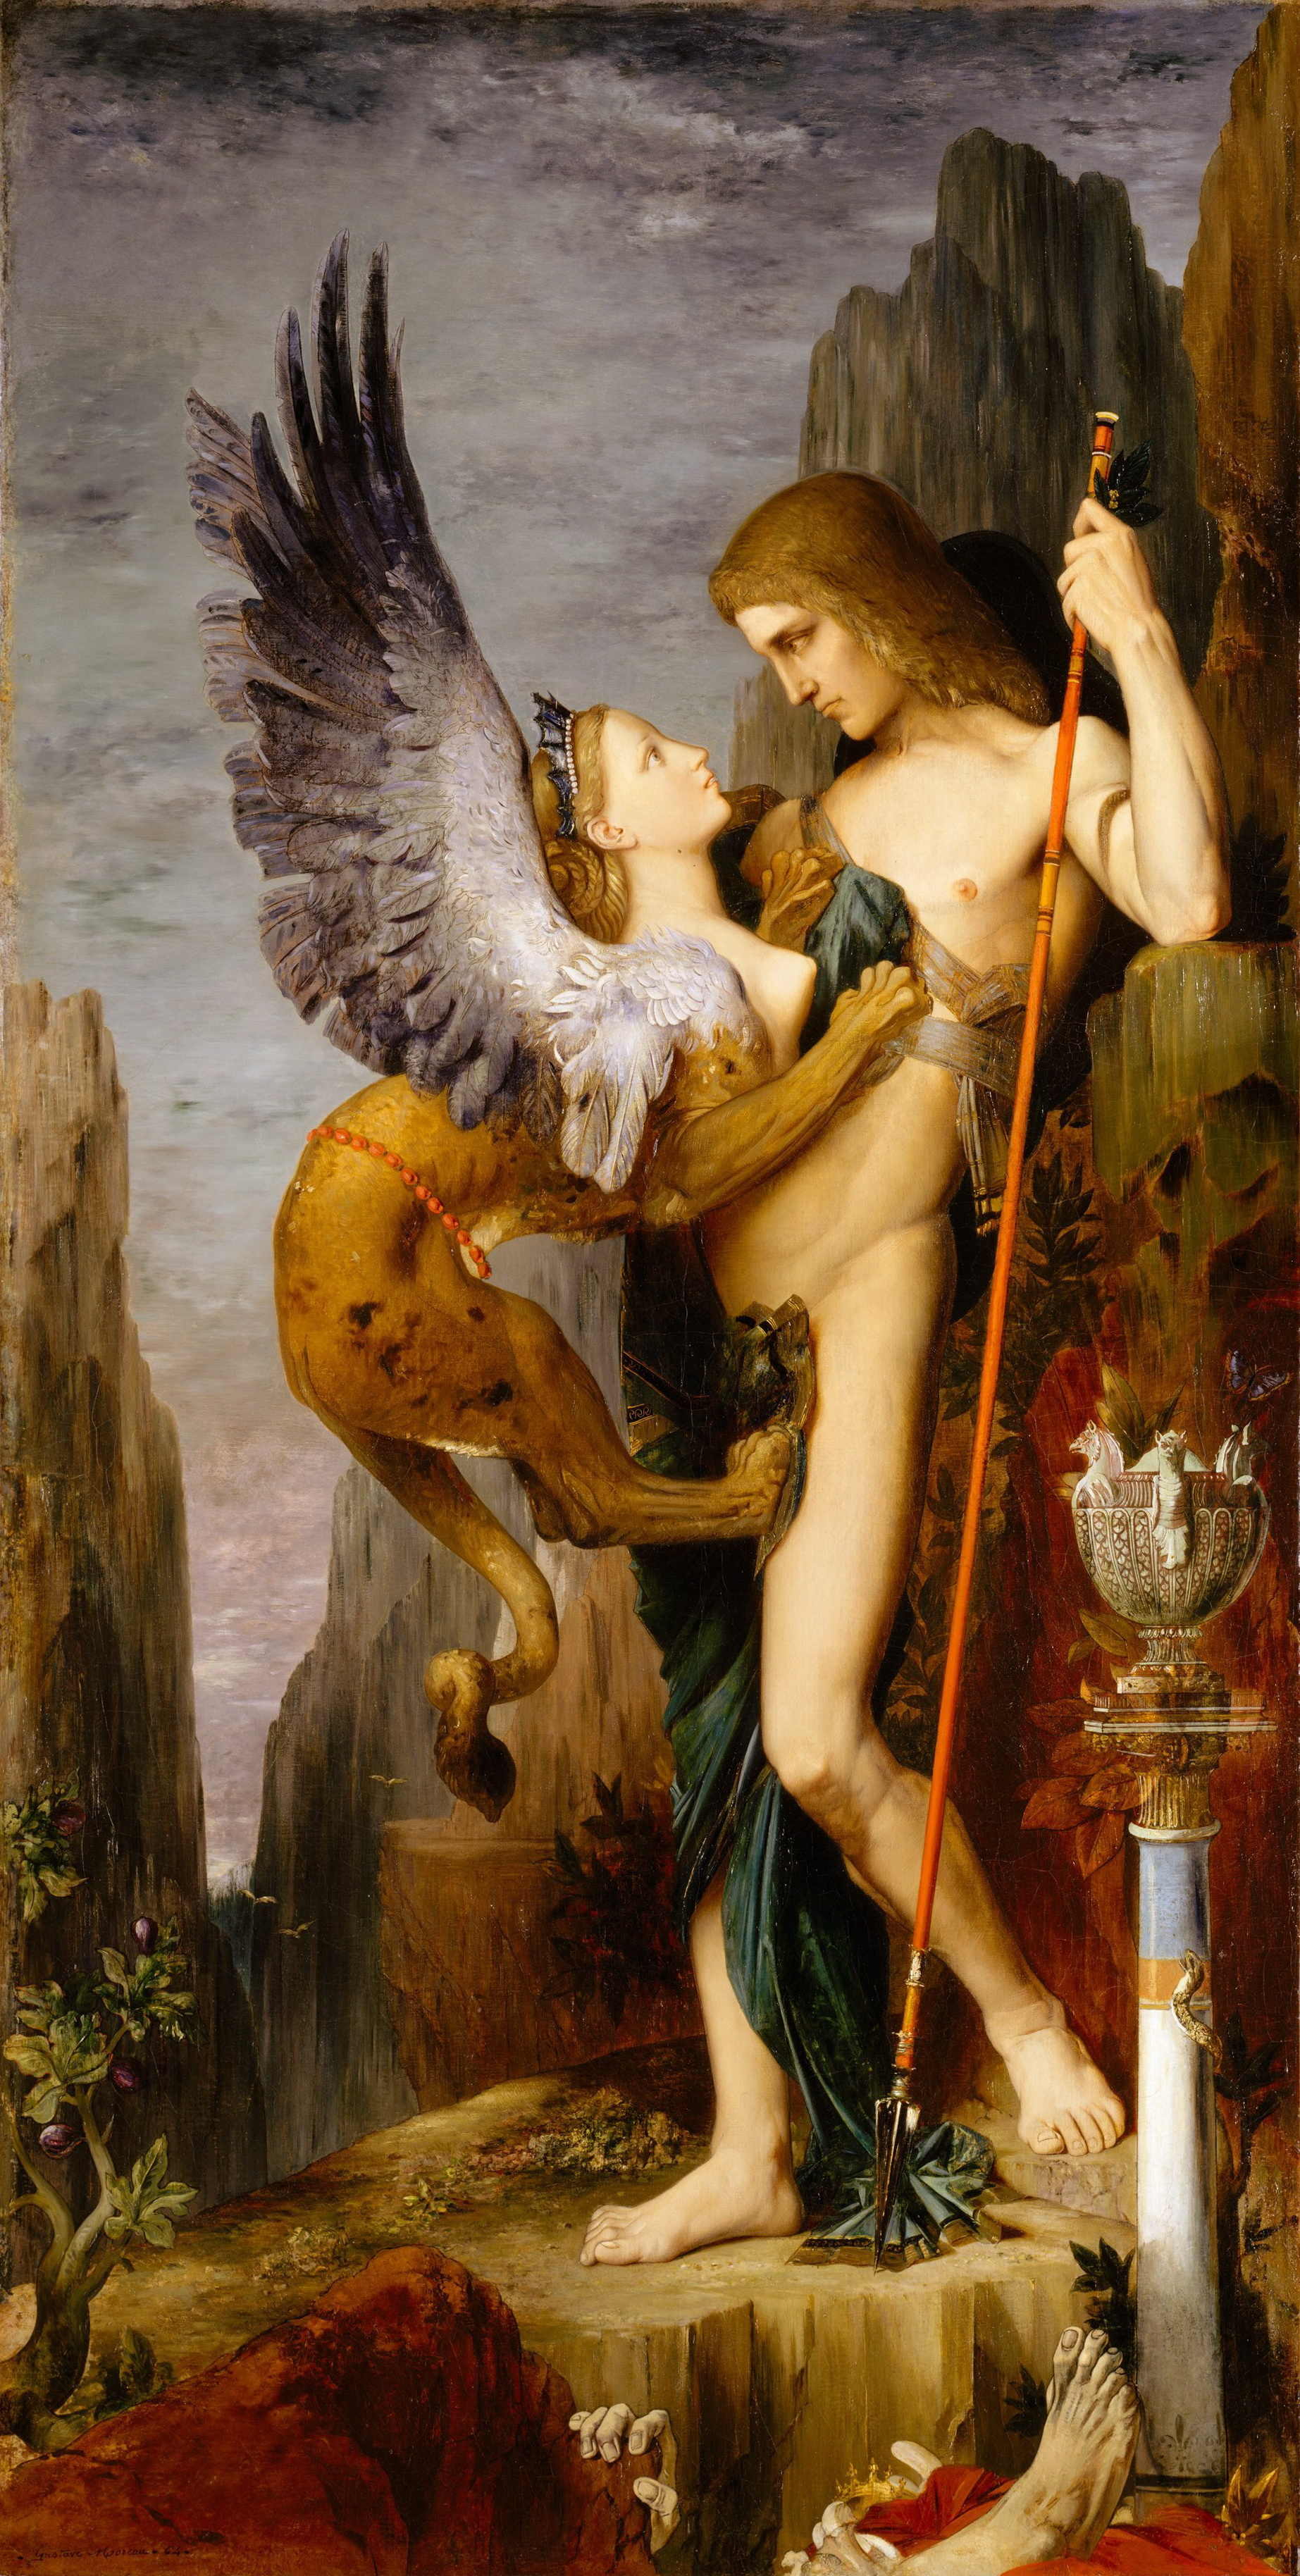 1864_Эдип и сфинкс (206.4 х 104.8 см) (Нью-Йорк, Музей Метрополитен)